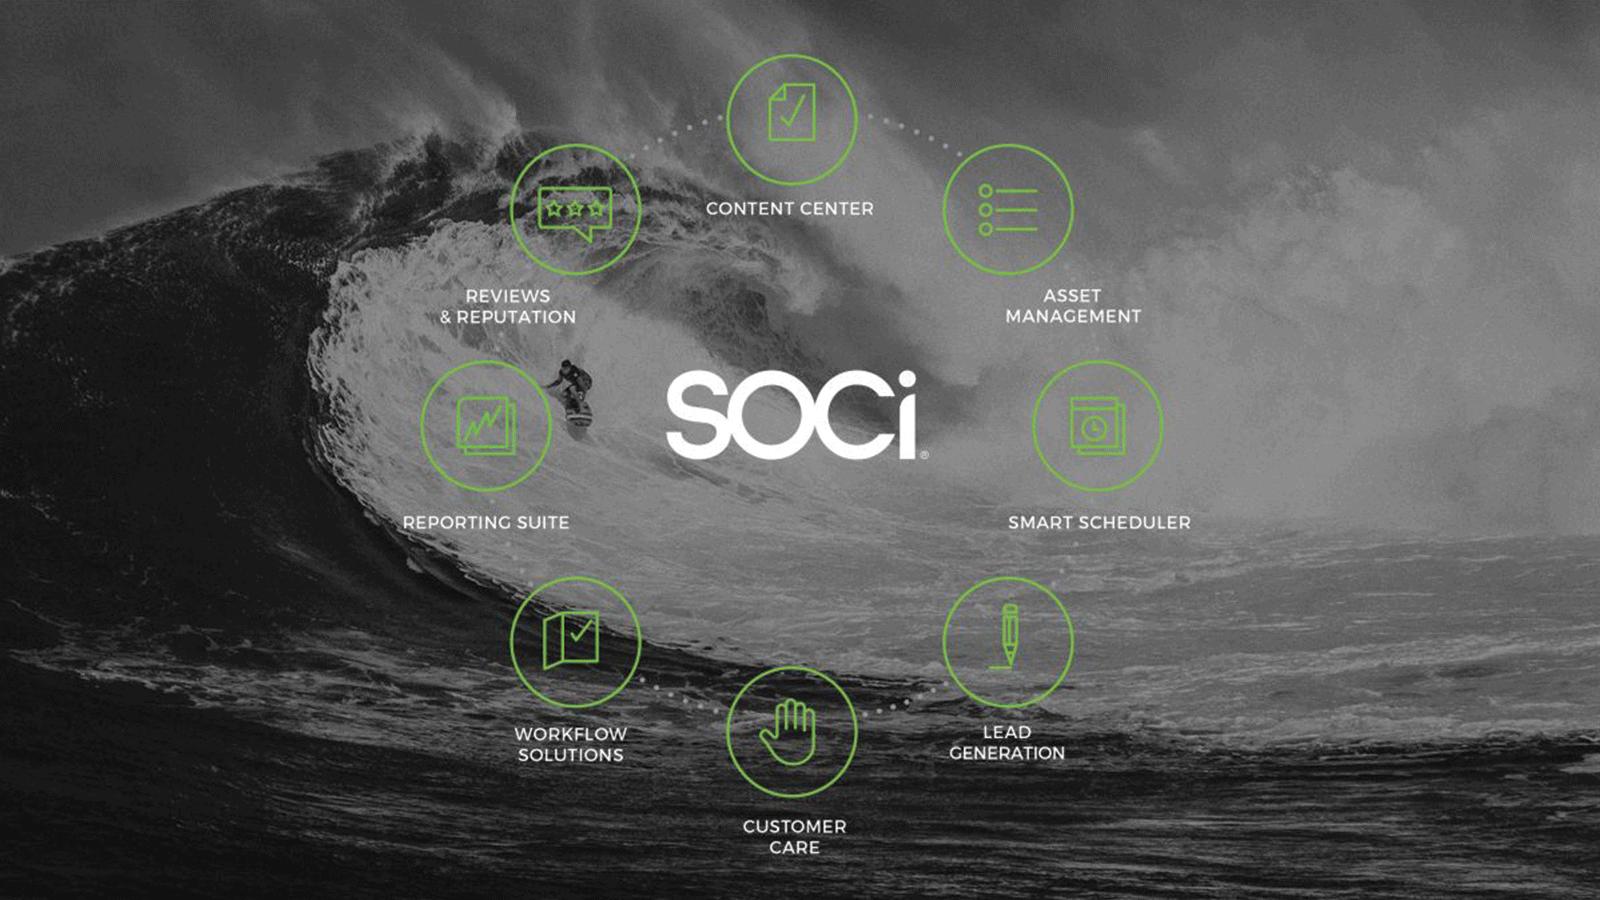 SOCi, social media management